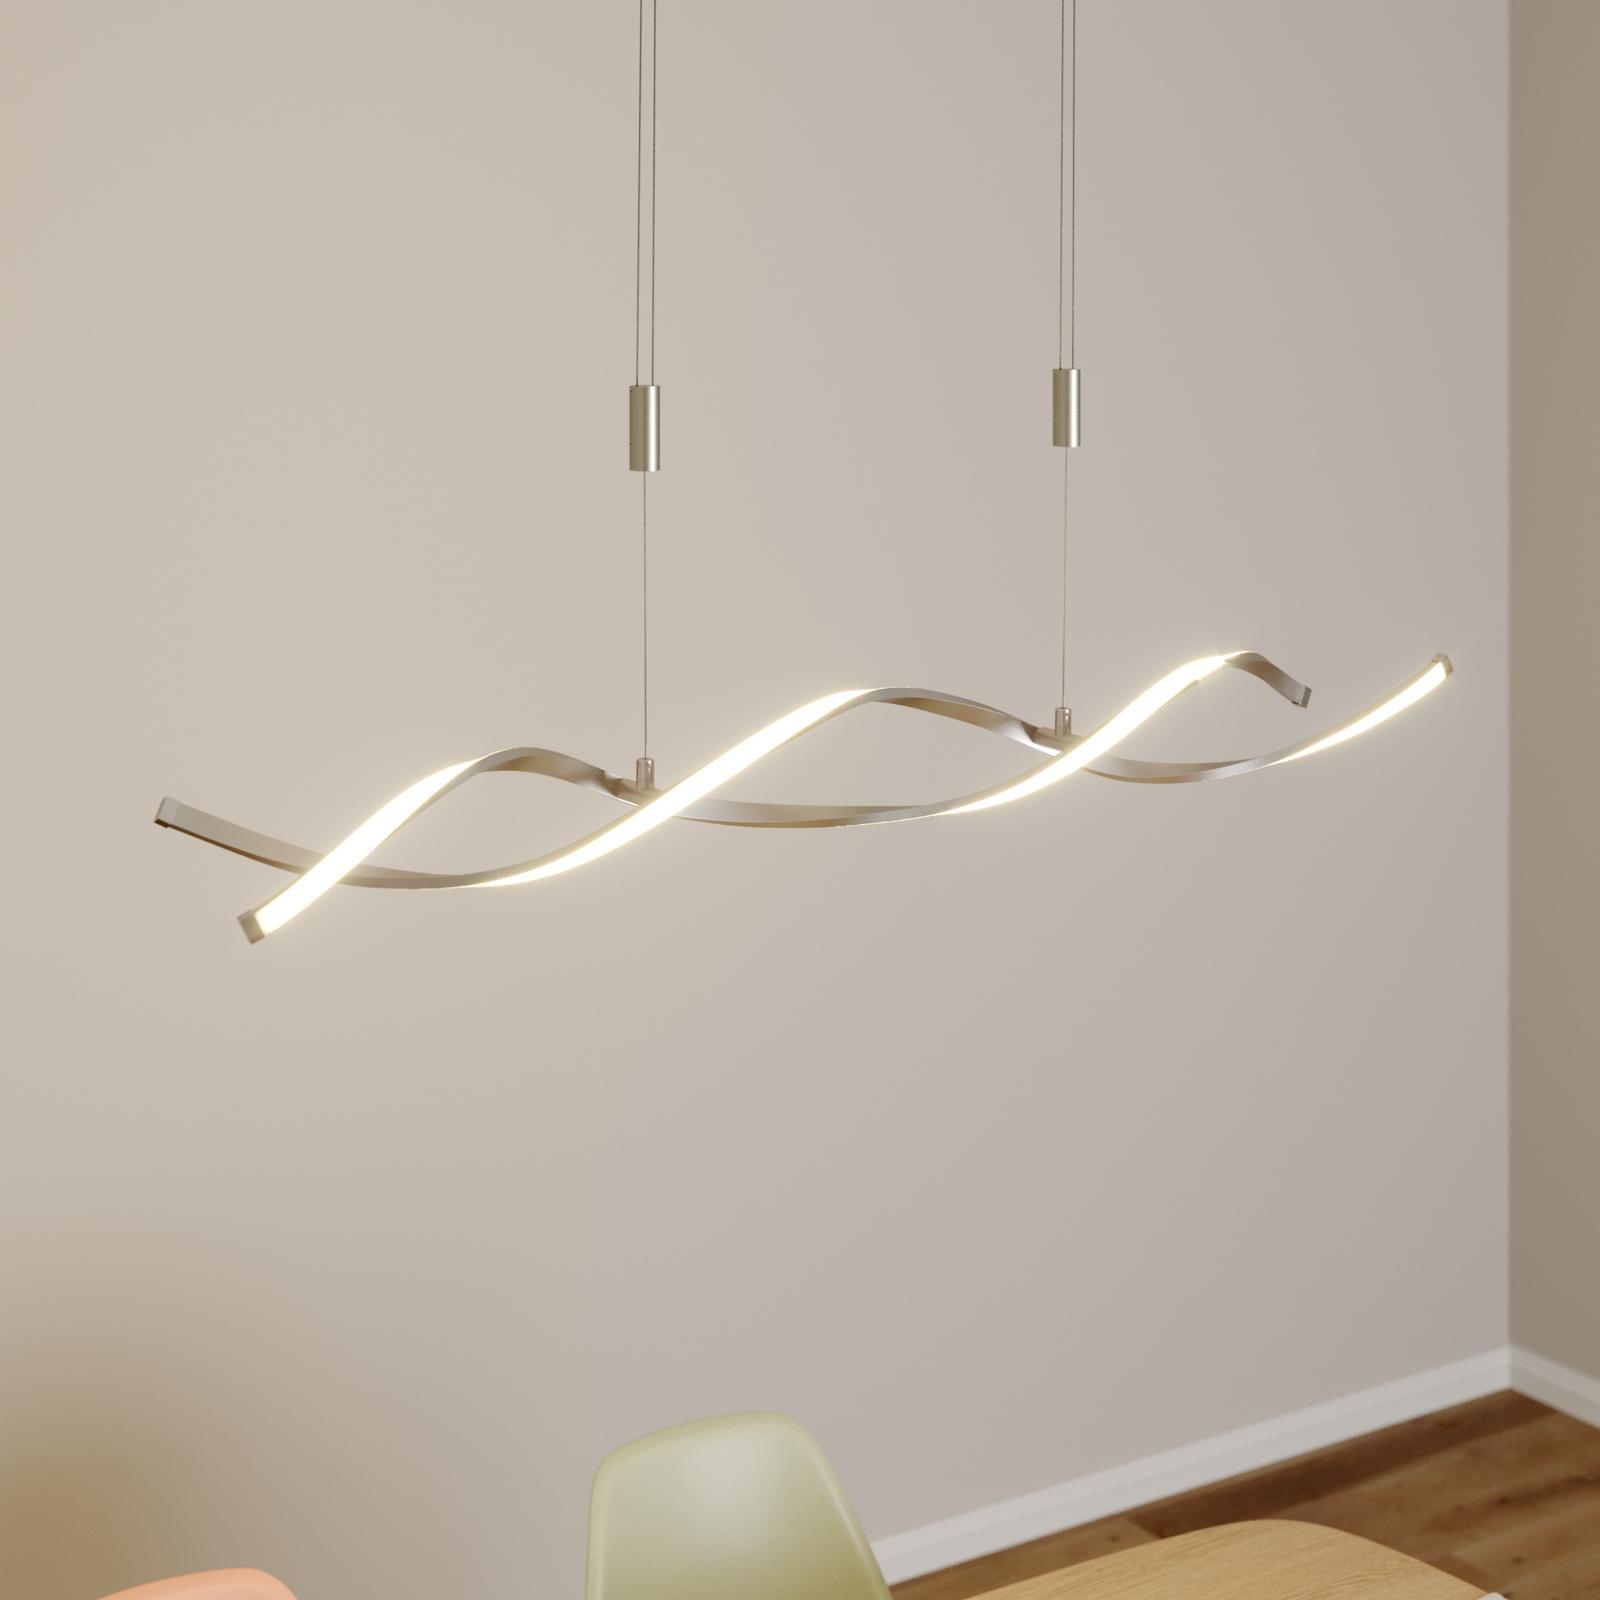 Lampada LED a sospensione Auron altezza regolabile